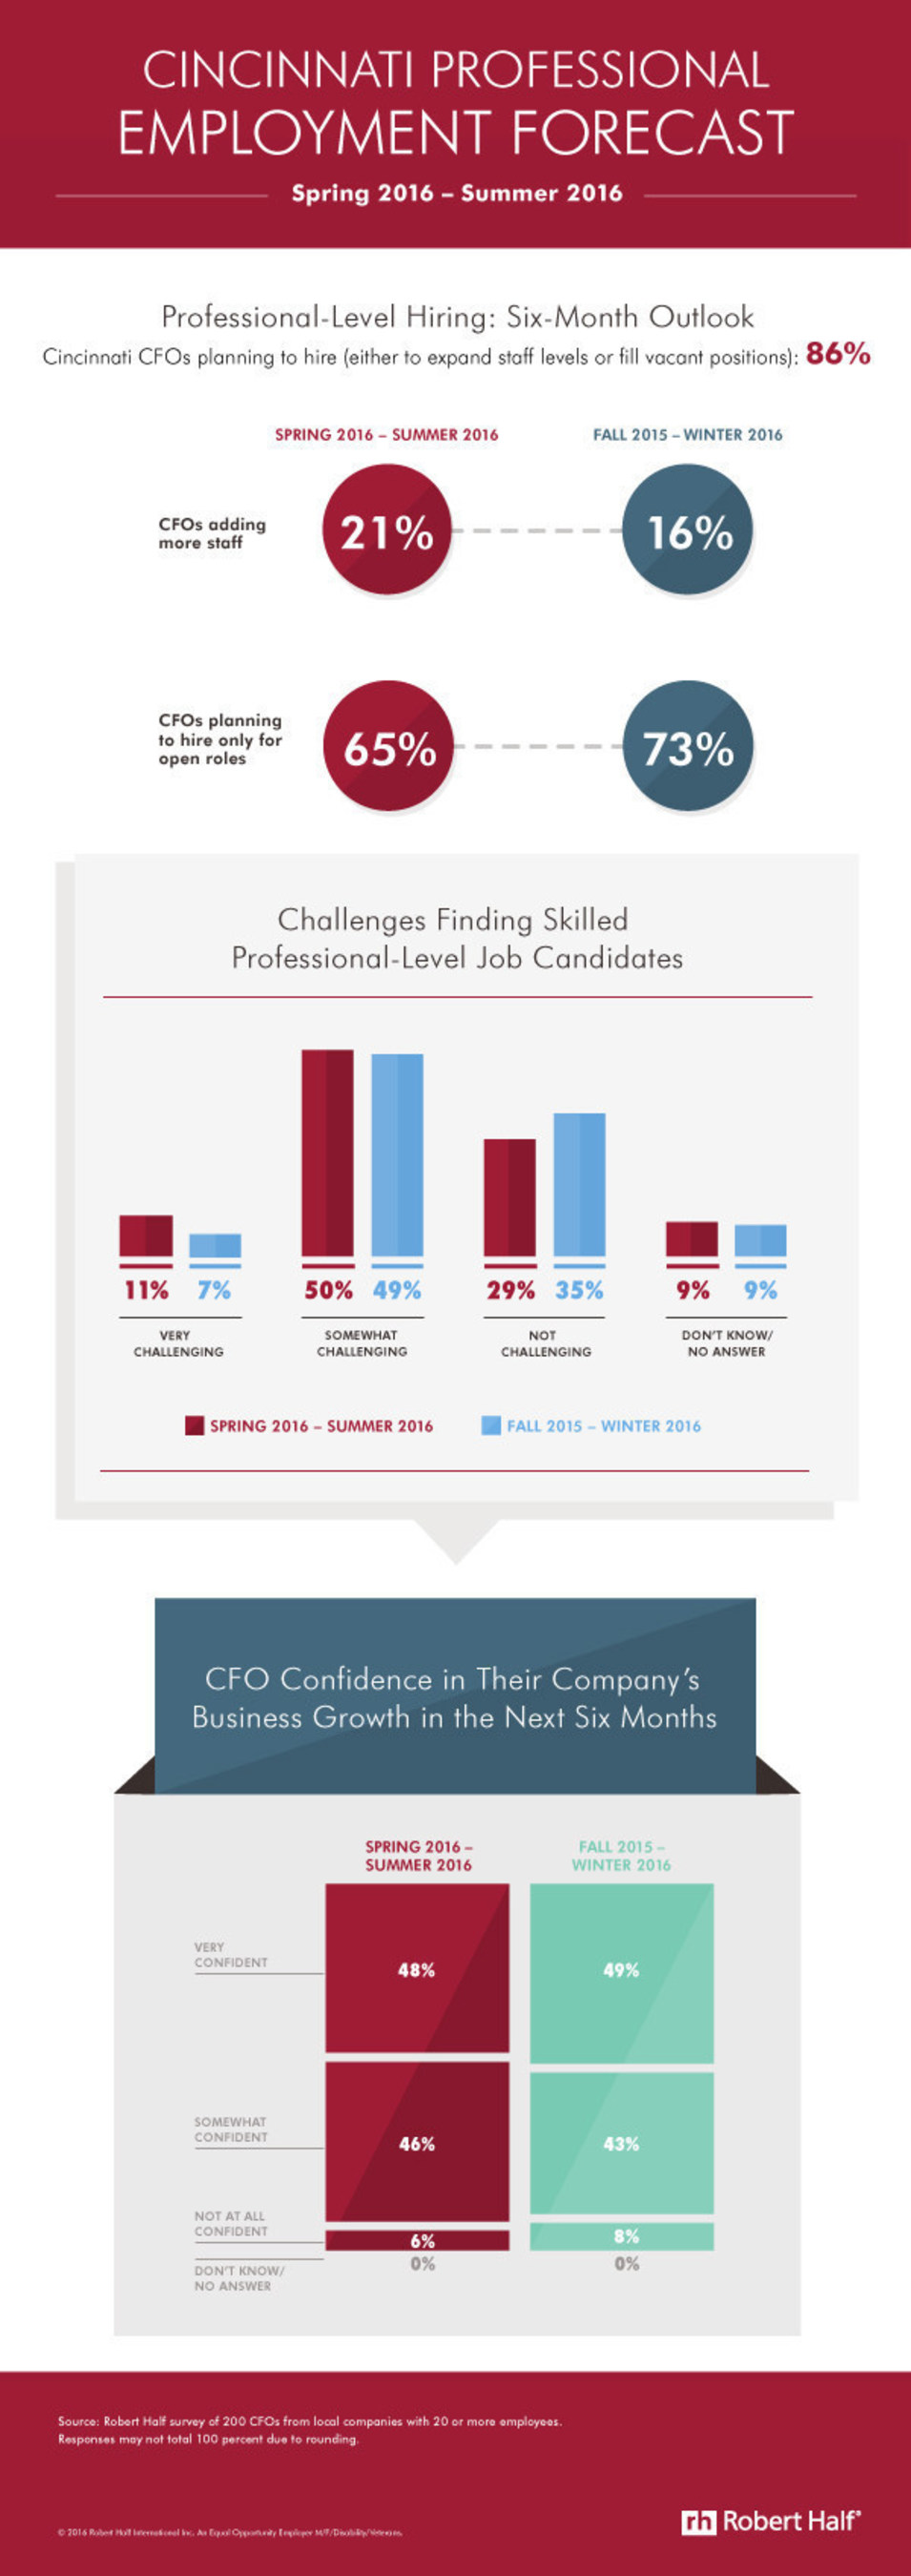 Cincinnati CFOs Expect Increased Hiring In Next Six Months